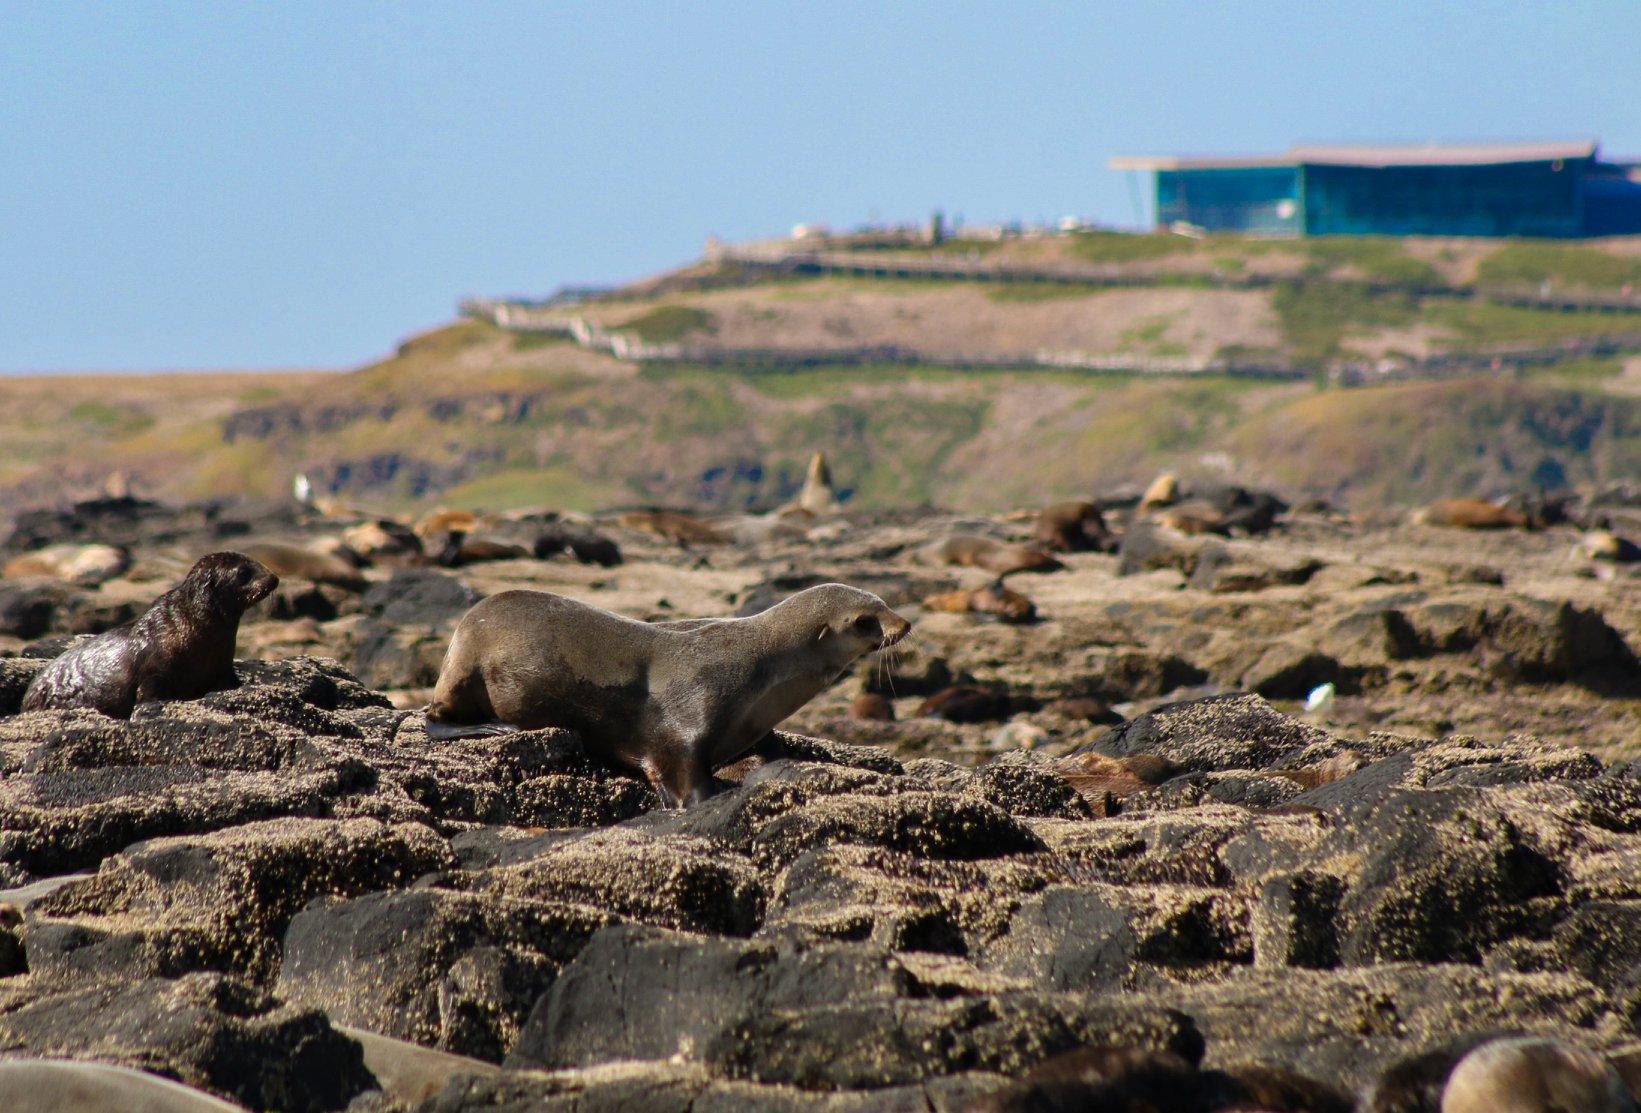 Australian Fur-seals